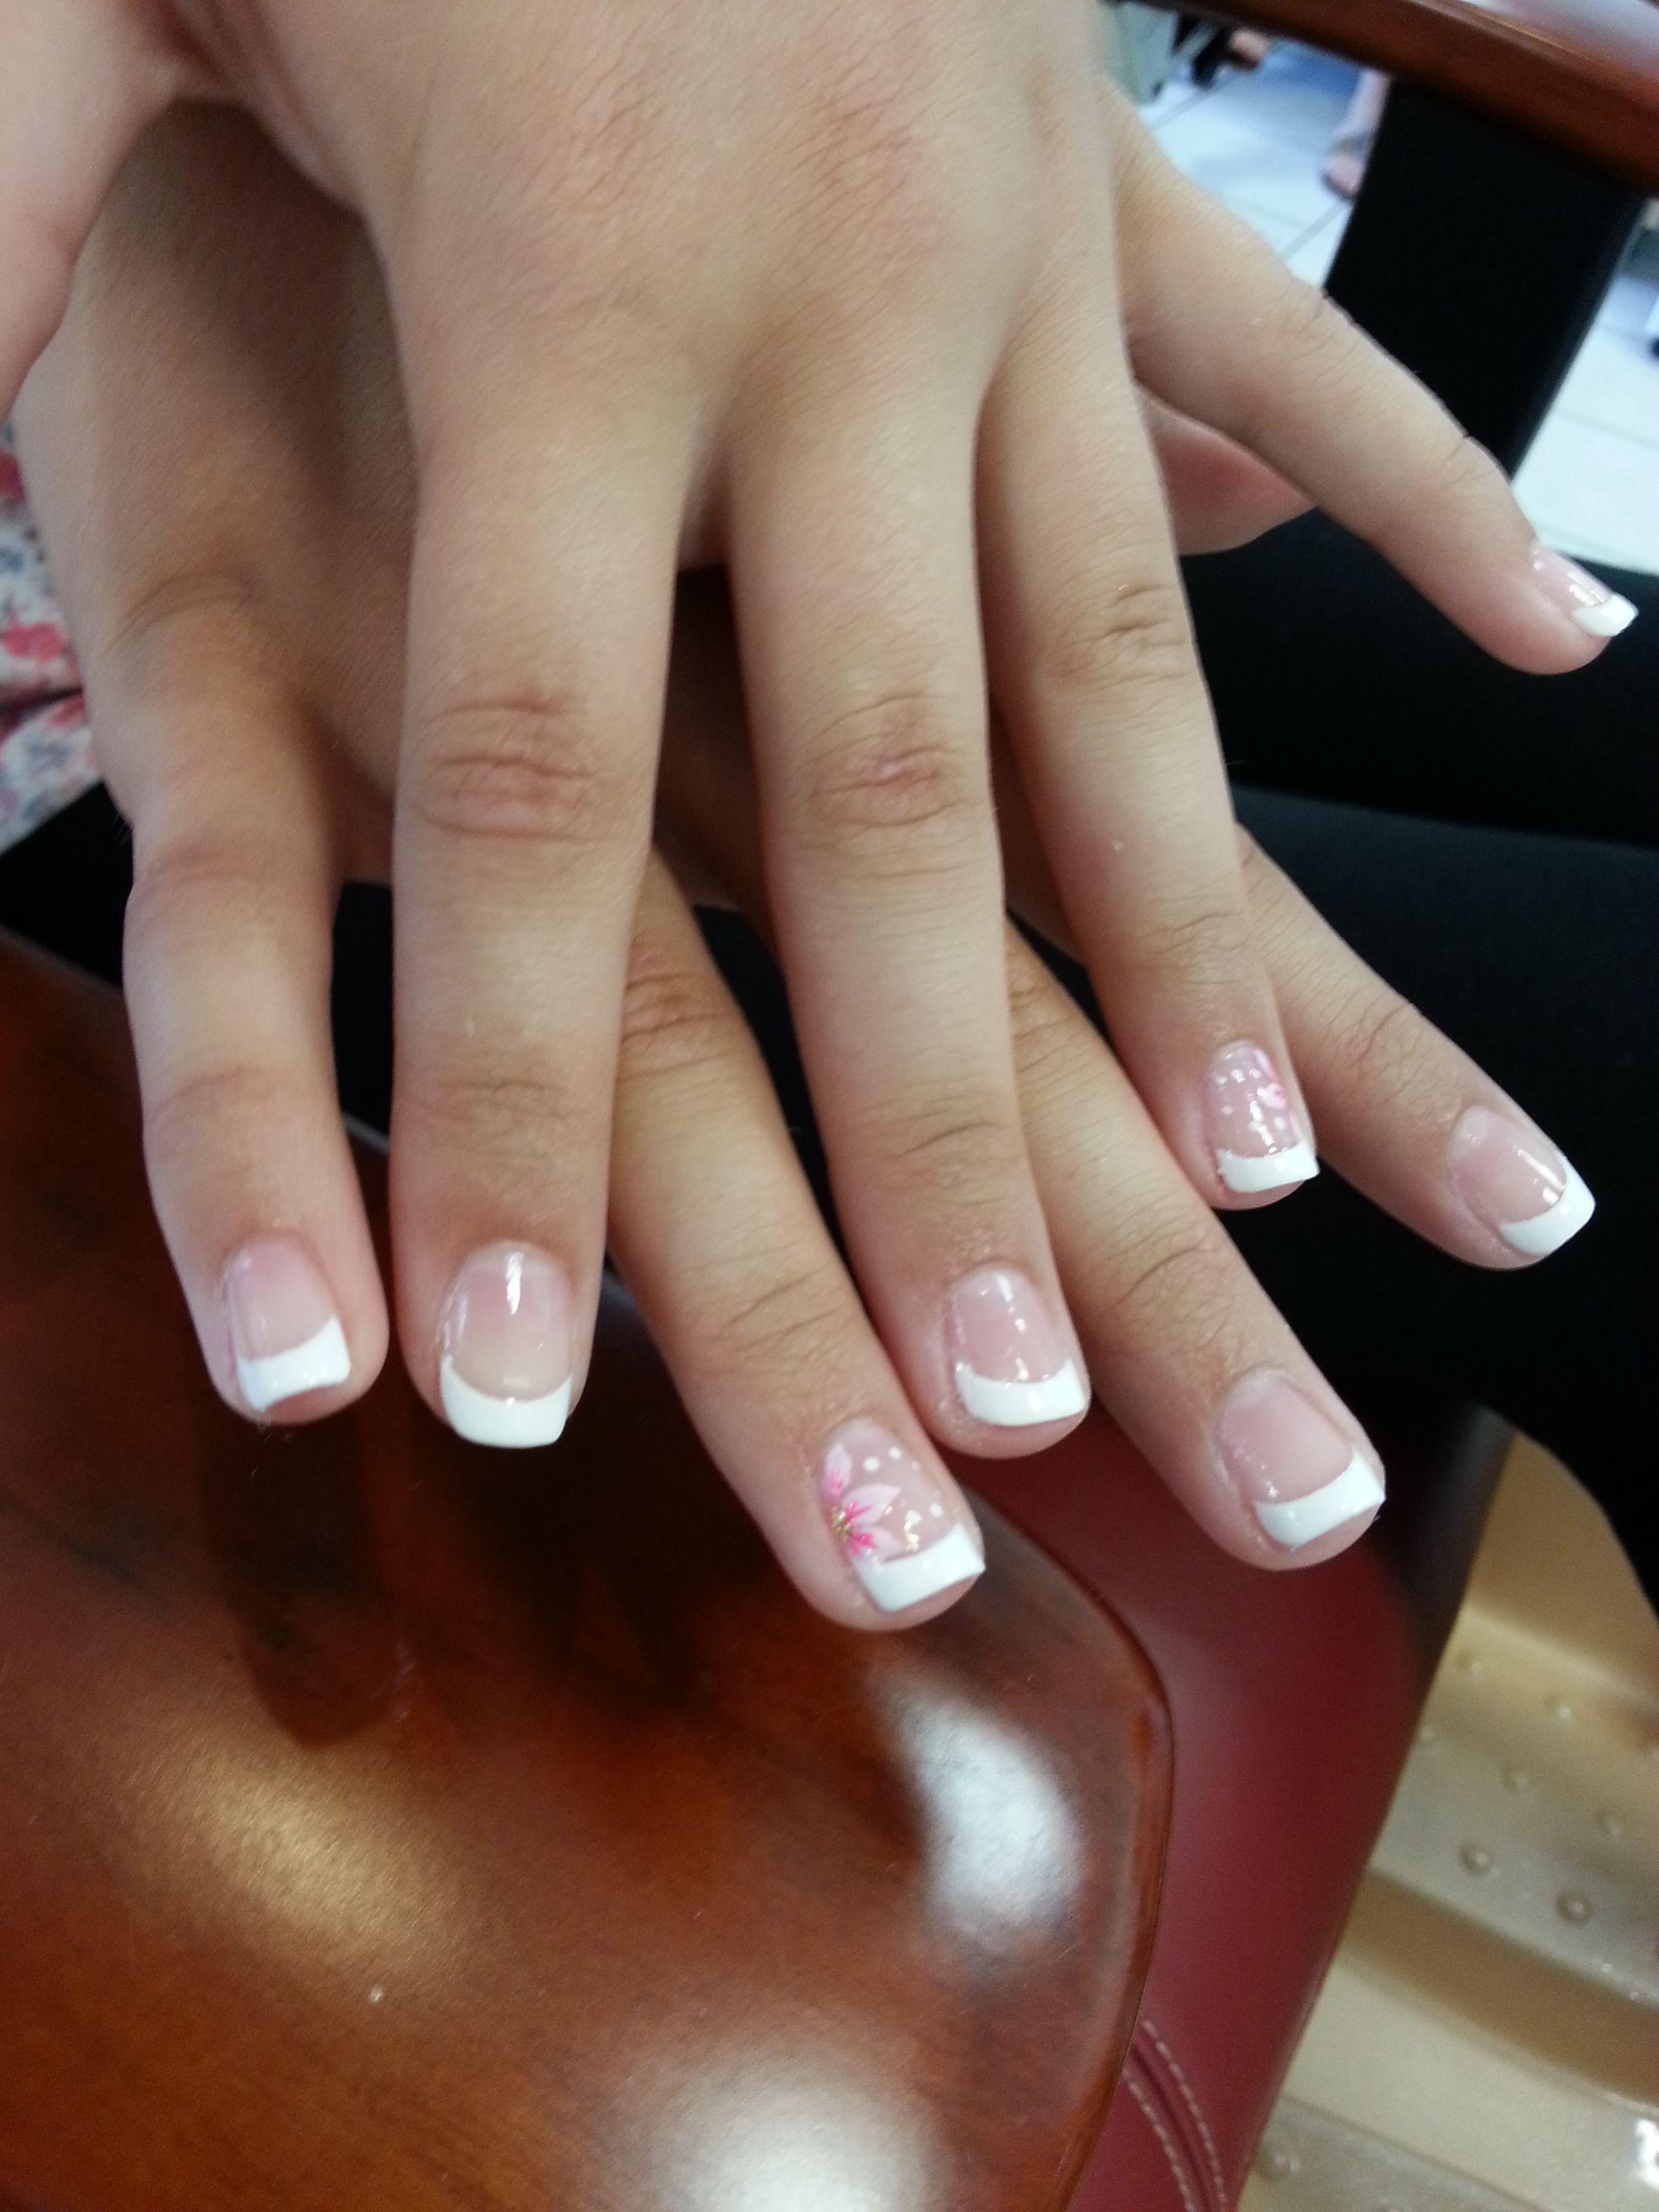 French nail for kid's. #frenchnail, #kidsnail, #nailforkid's, #flowernails, #naildesign,